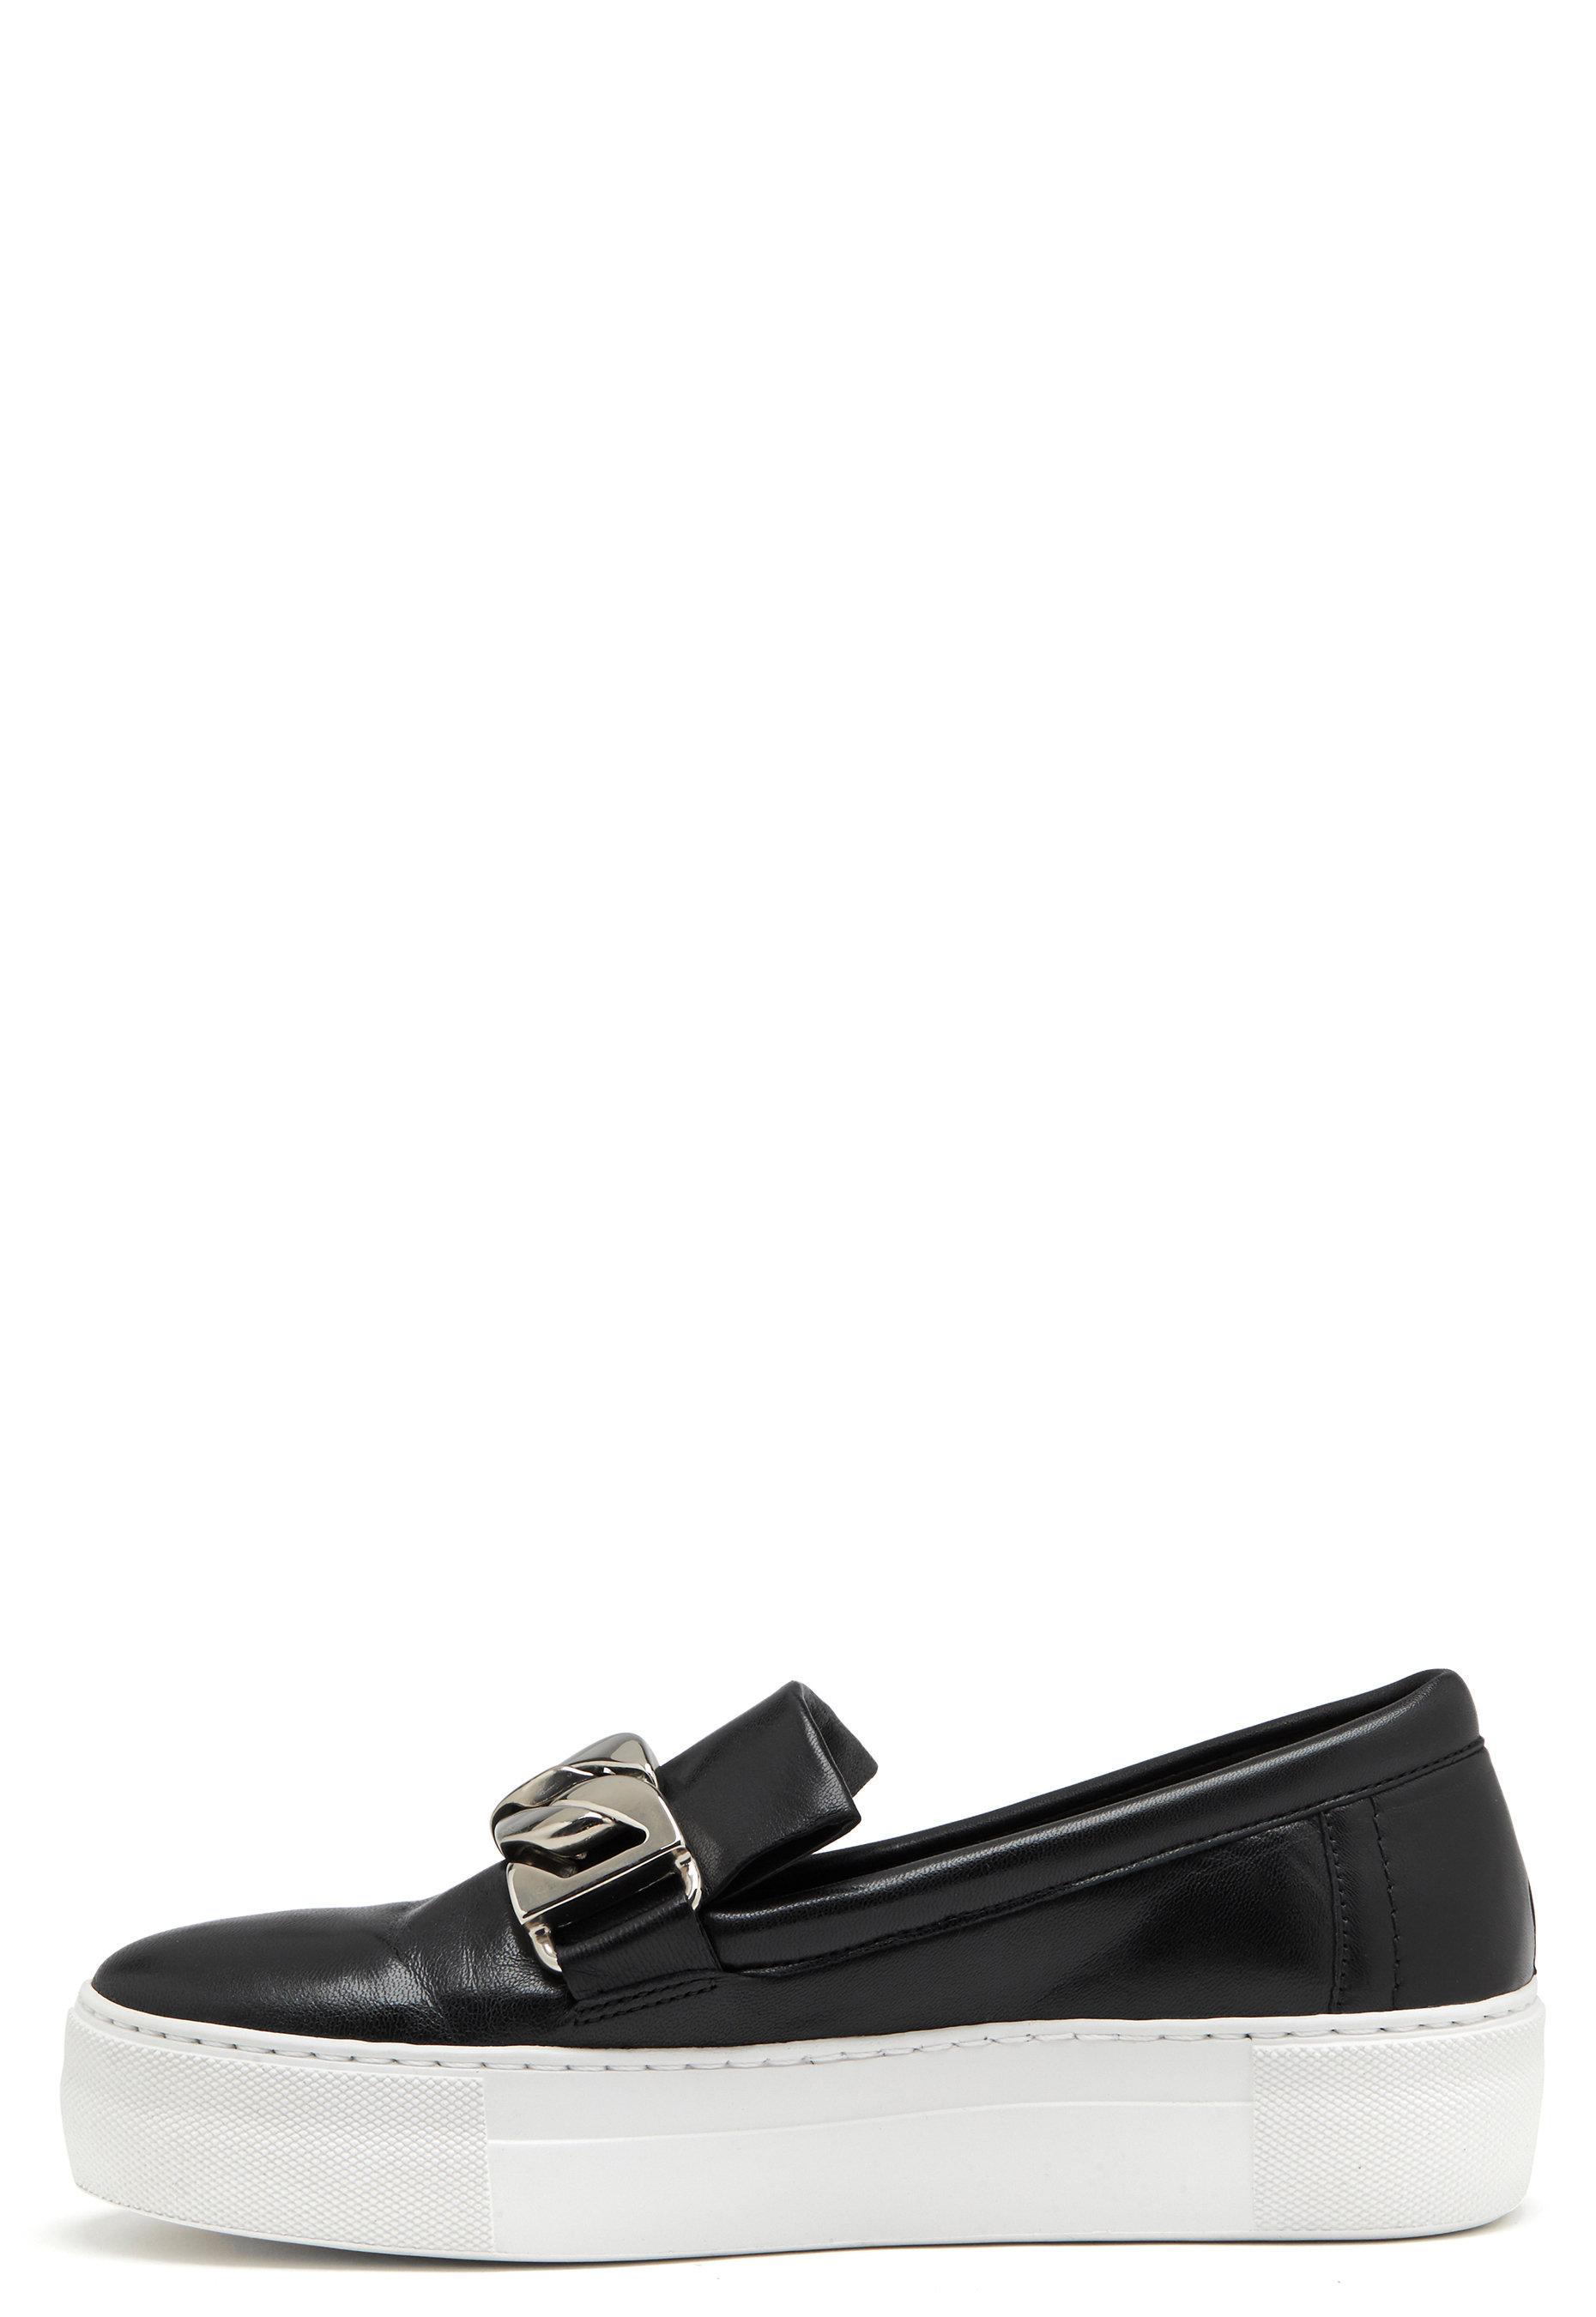 250c918b609 Billi Bi Leather Sneakers Black - Bubbleroom